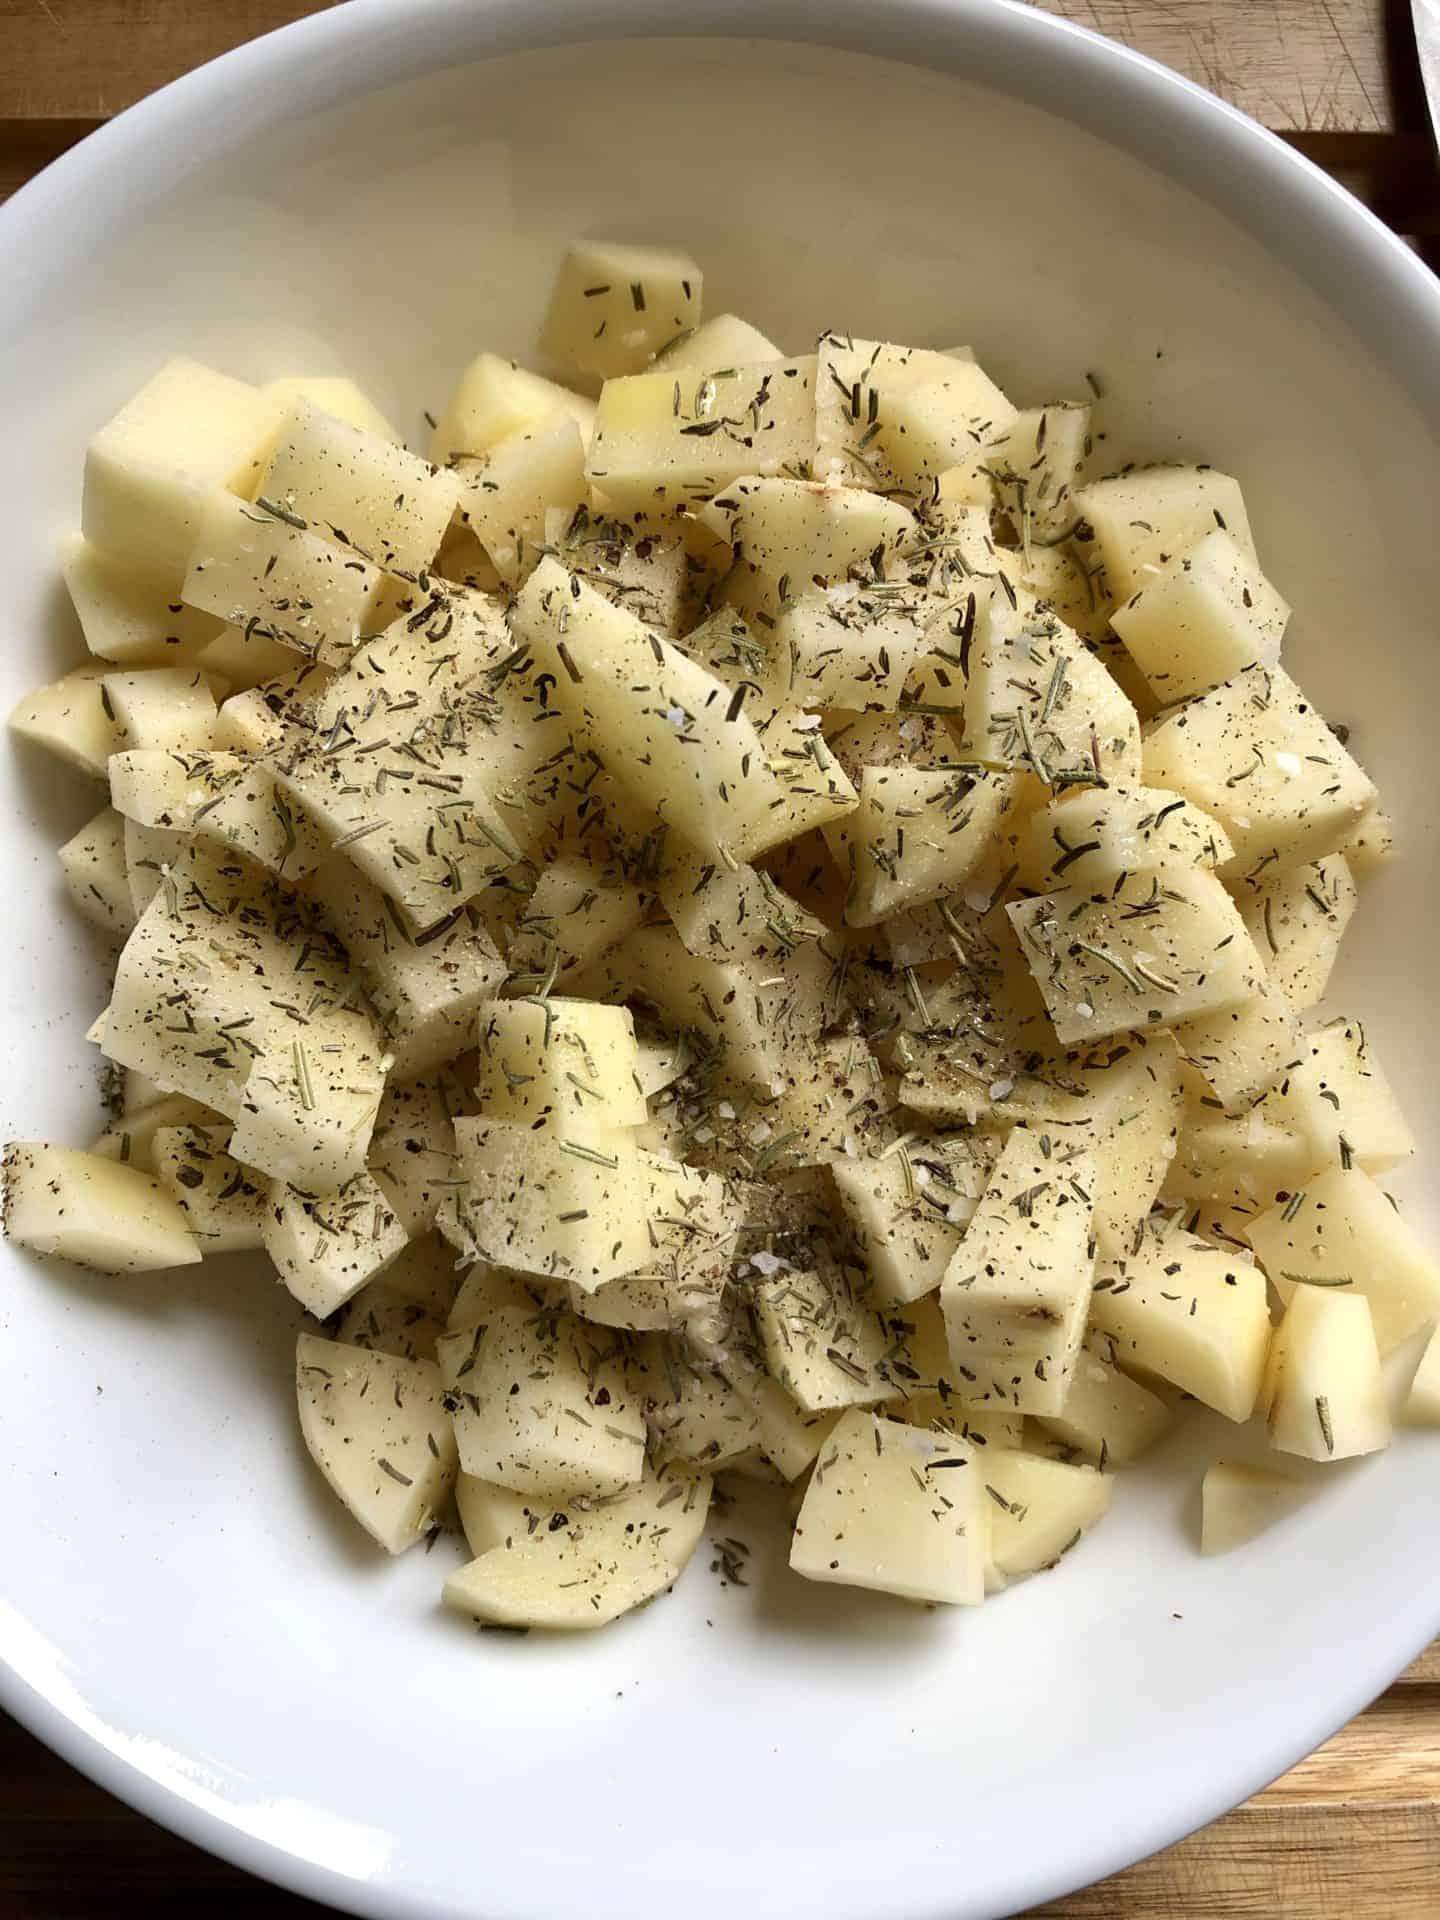 diced potatoes in bowl with seasonings